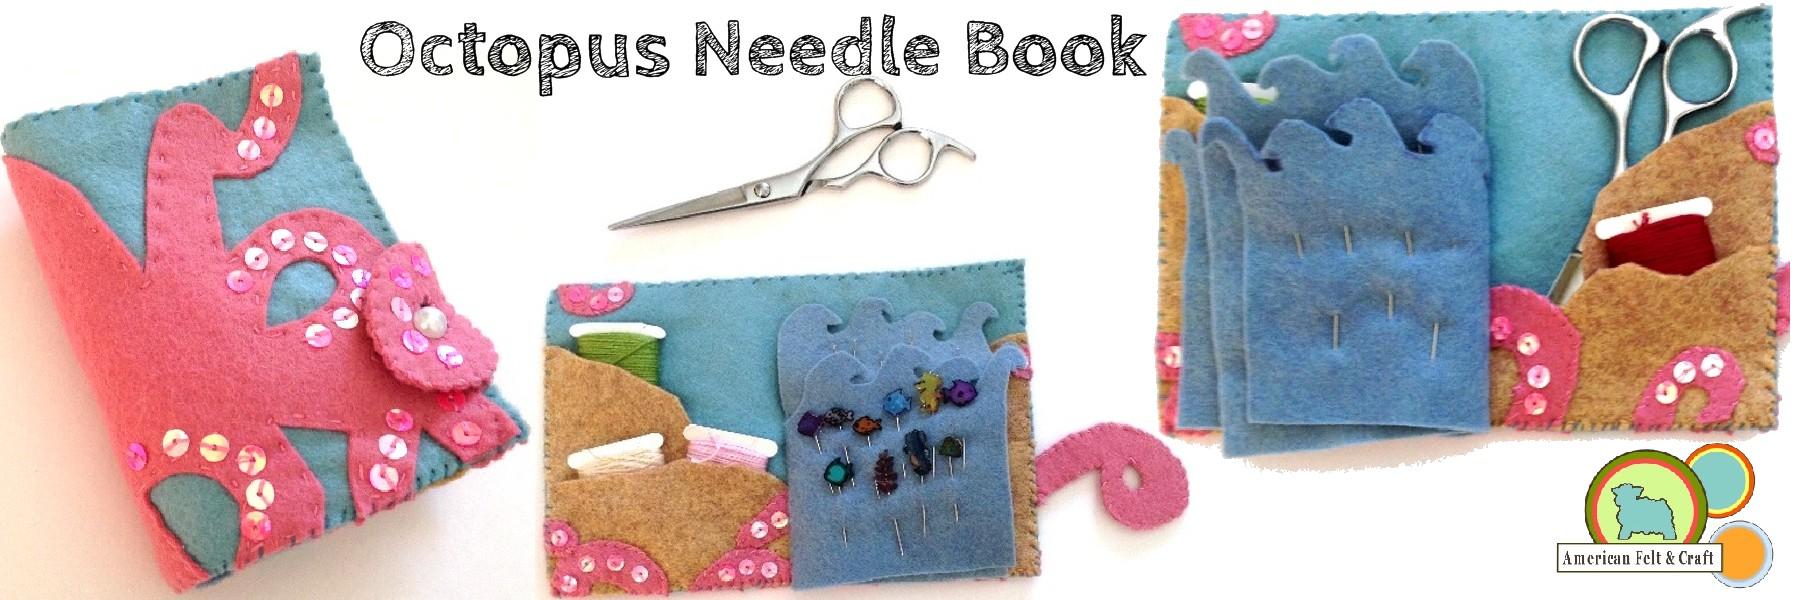 Felt craft book - Octopus Needlebook Felt Craft Tutorial